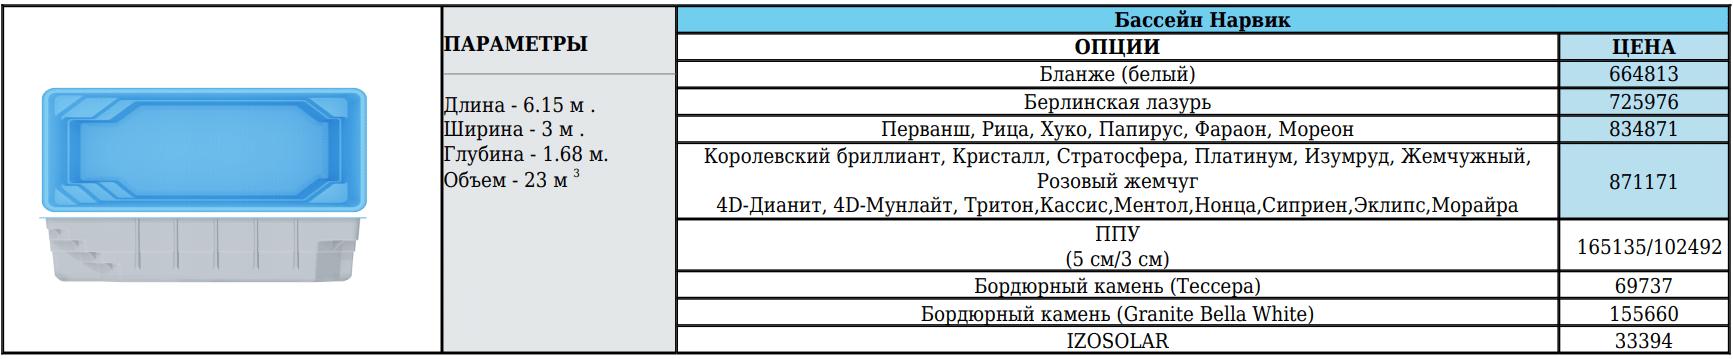 pic_4915c62882c5370bd38df4c1f5897d52_1920x9000_1.png